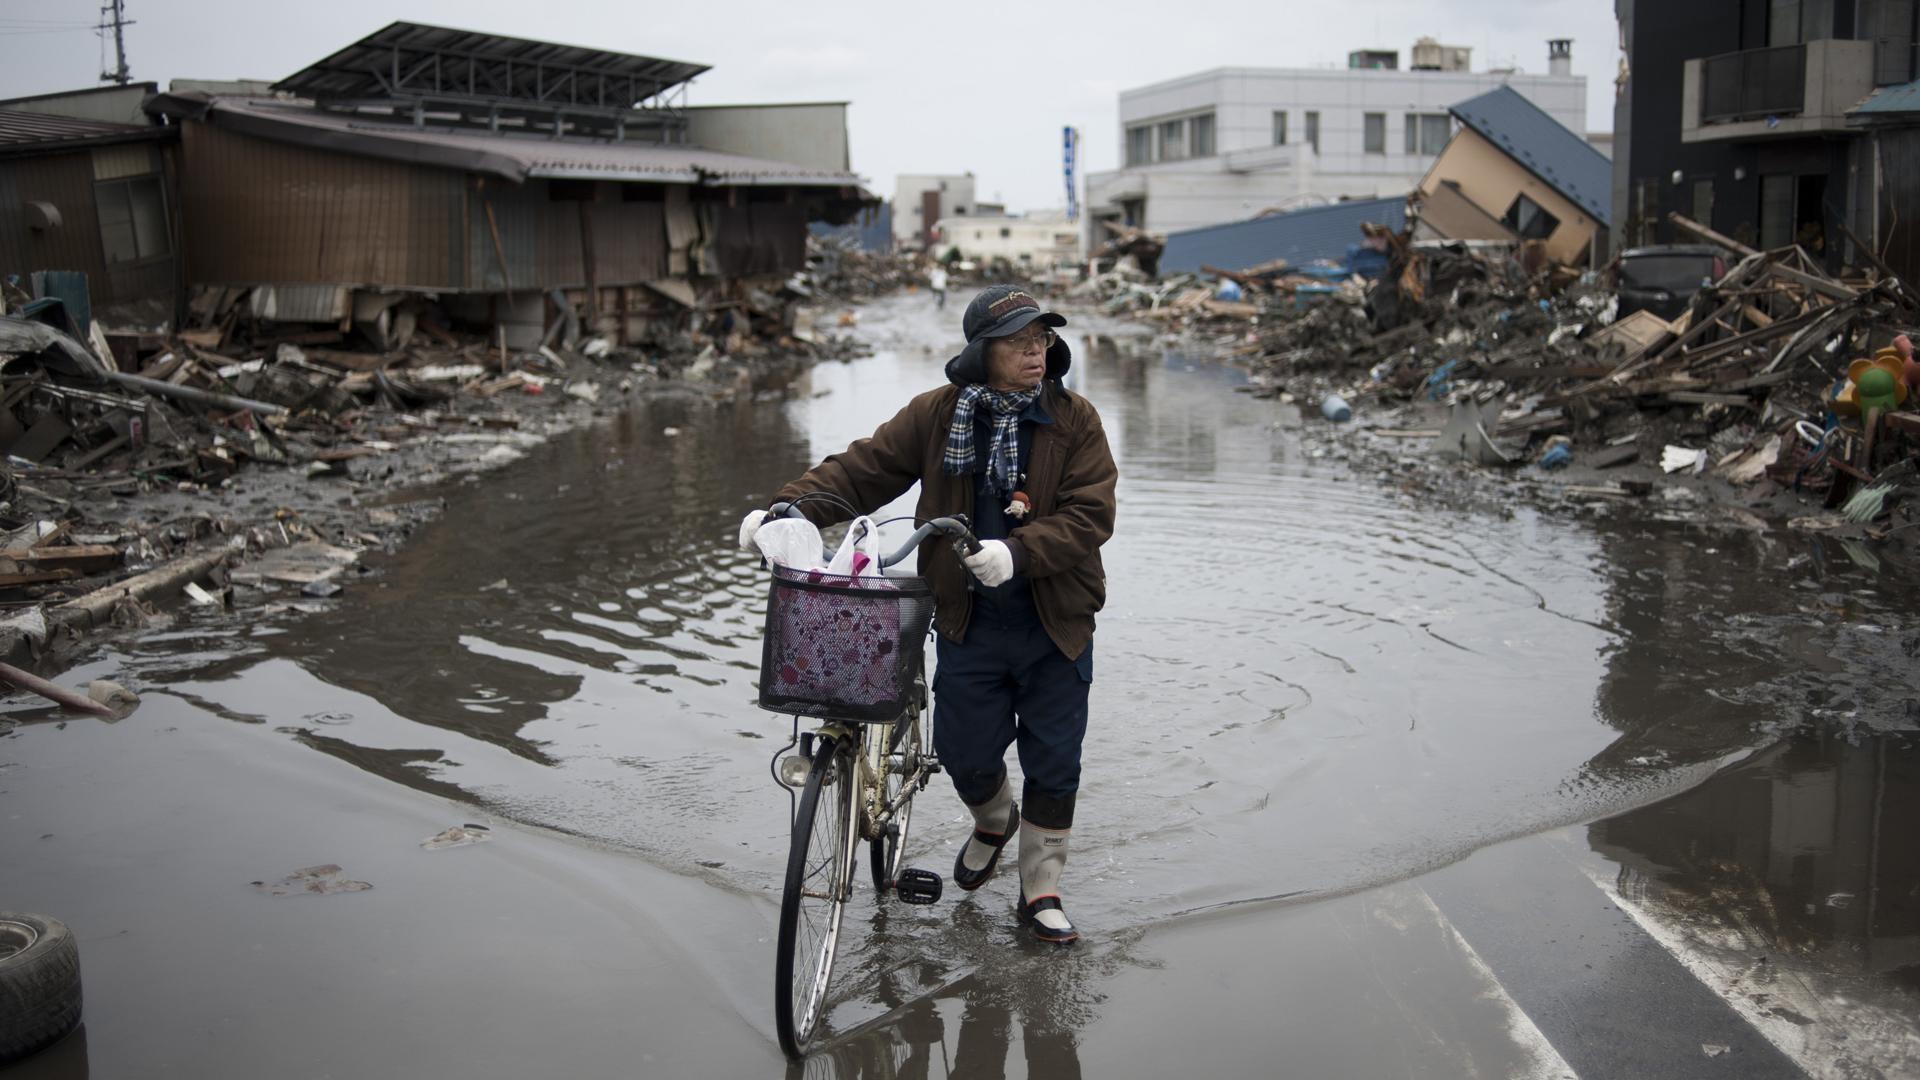 Japan's Killer Quake Hero